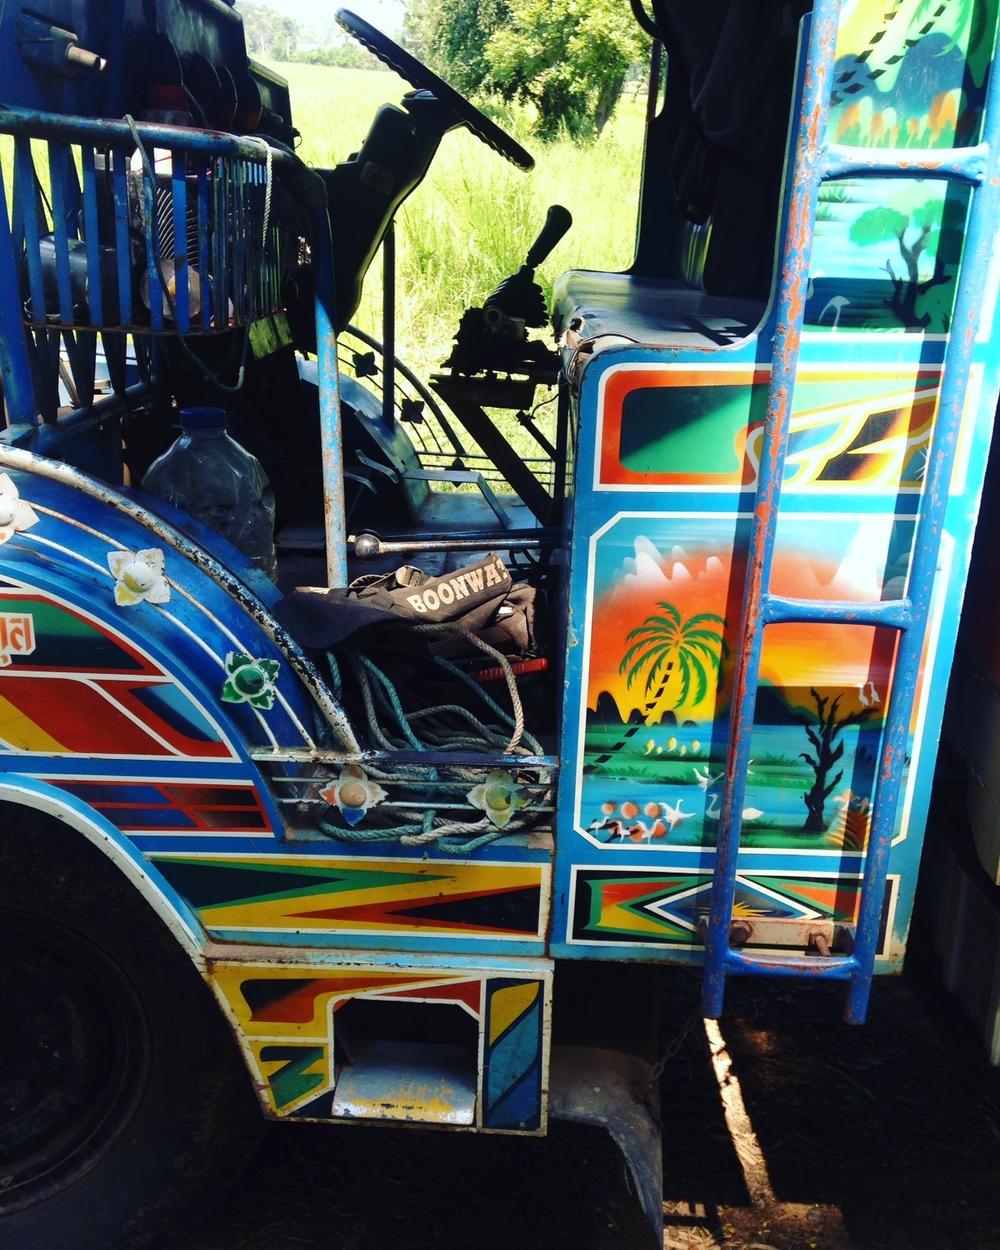 A colorful farm truck